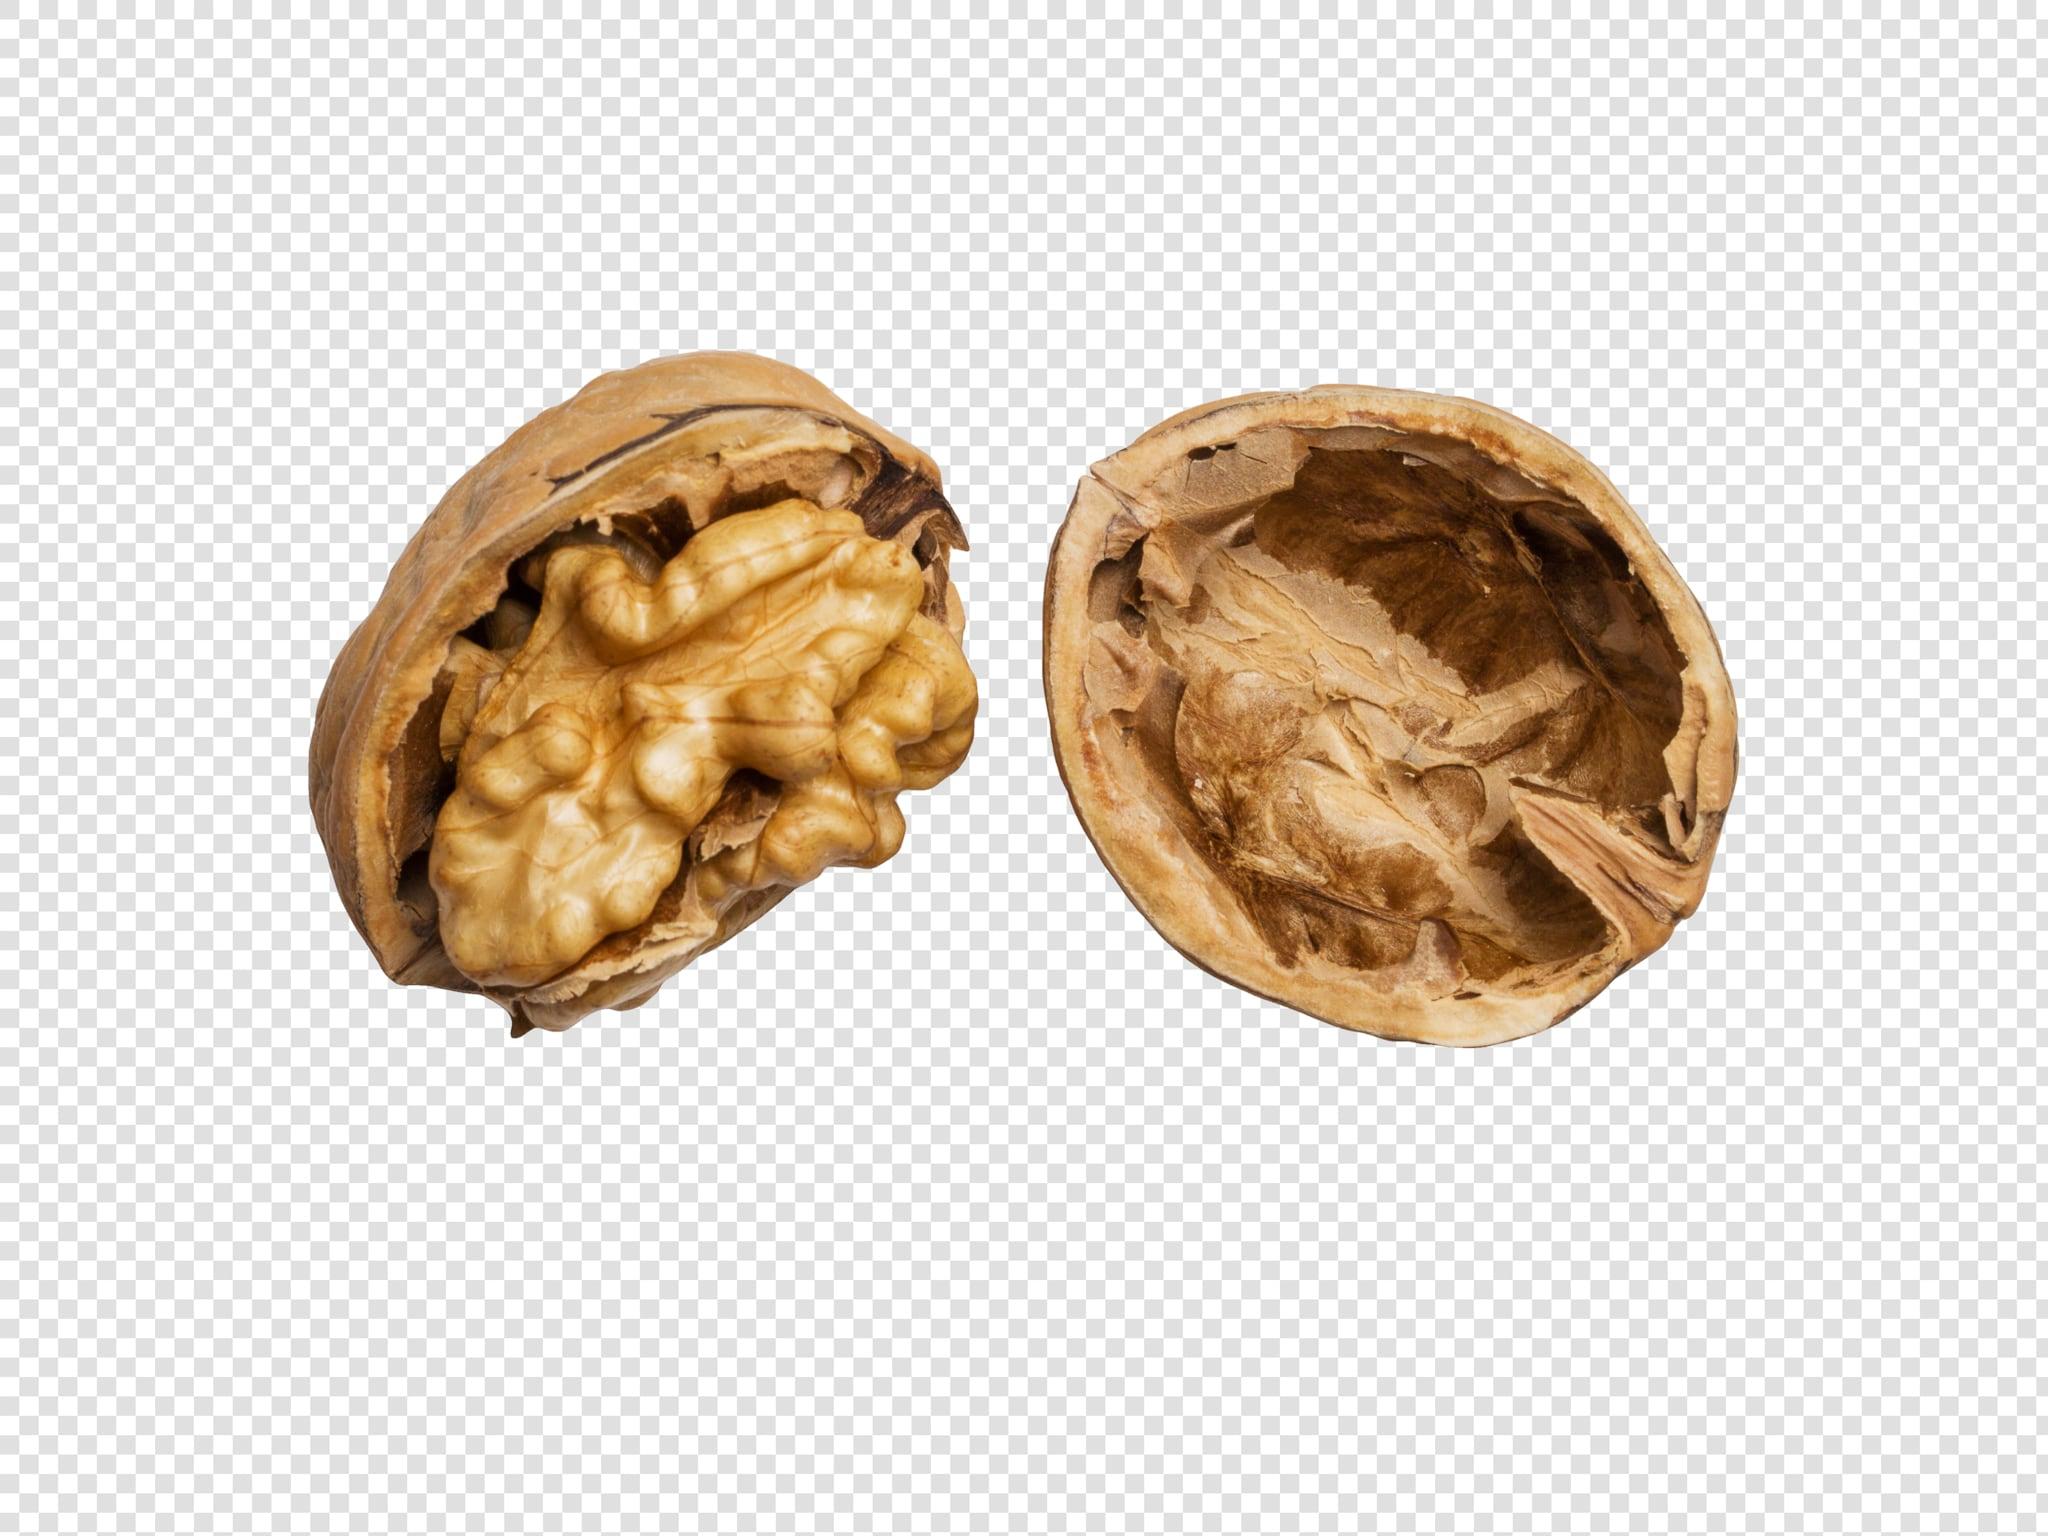 Walnut PSD image with transparent background